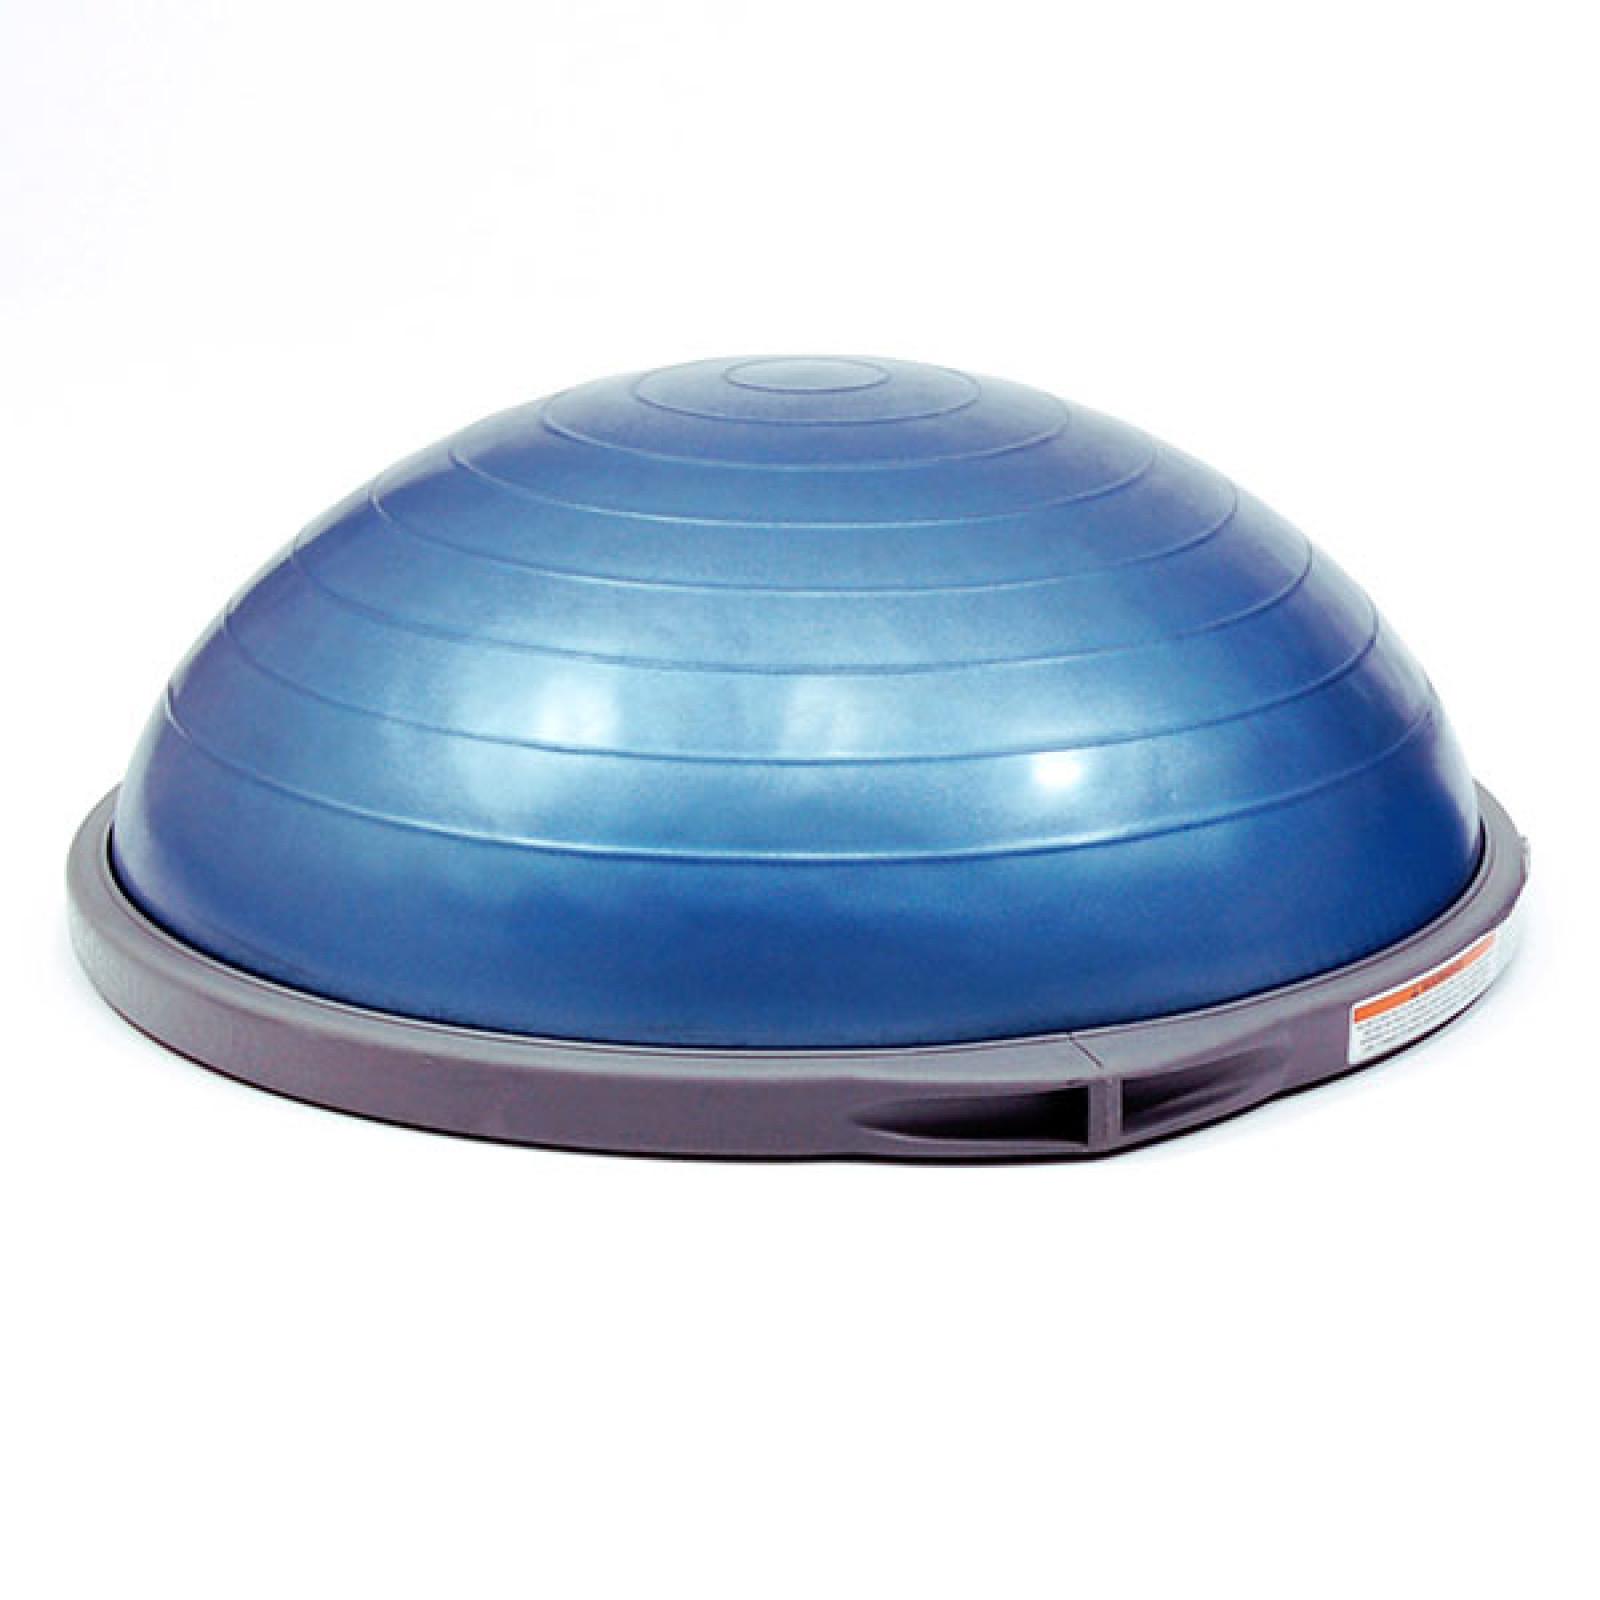 Bosu Balance Trainer Pro Commercial Powerhouse Fitness